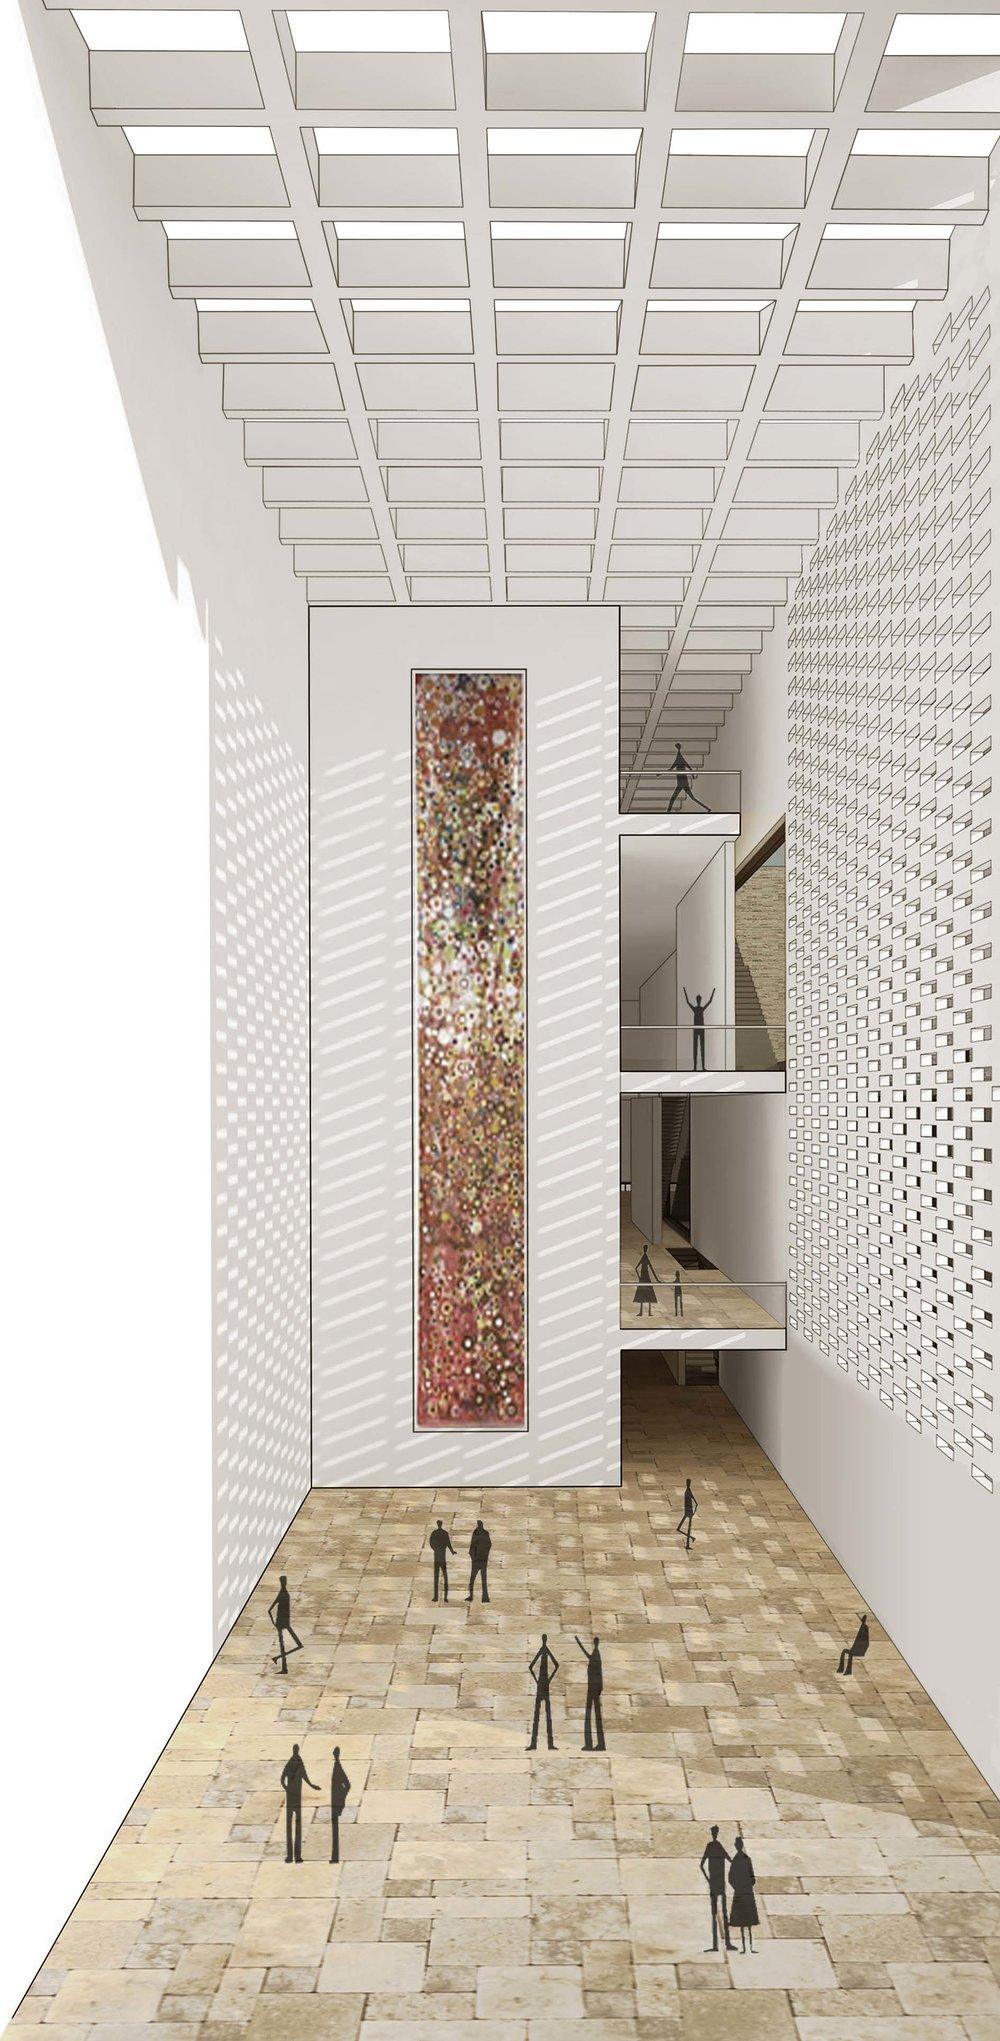 Interior rendering 2.jpg